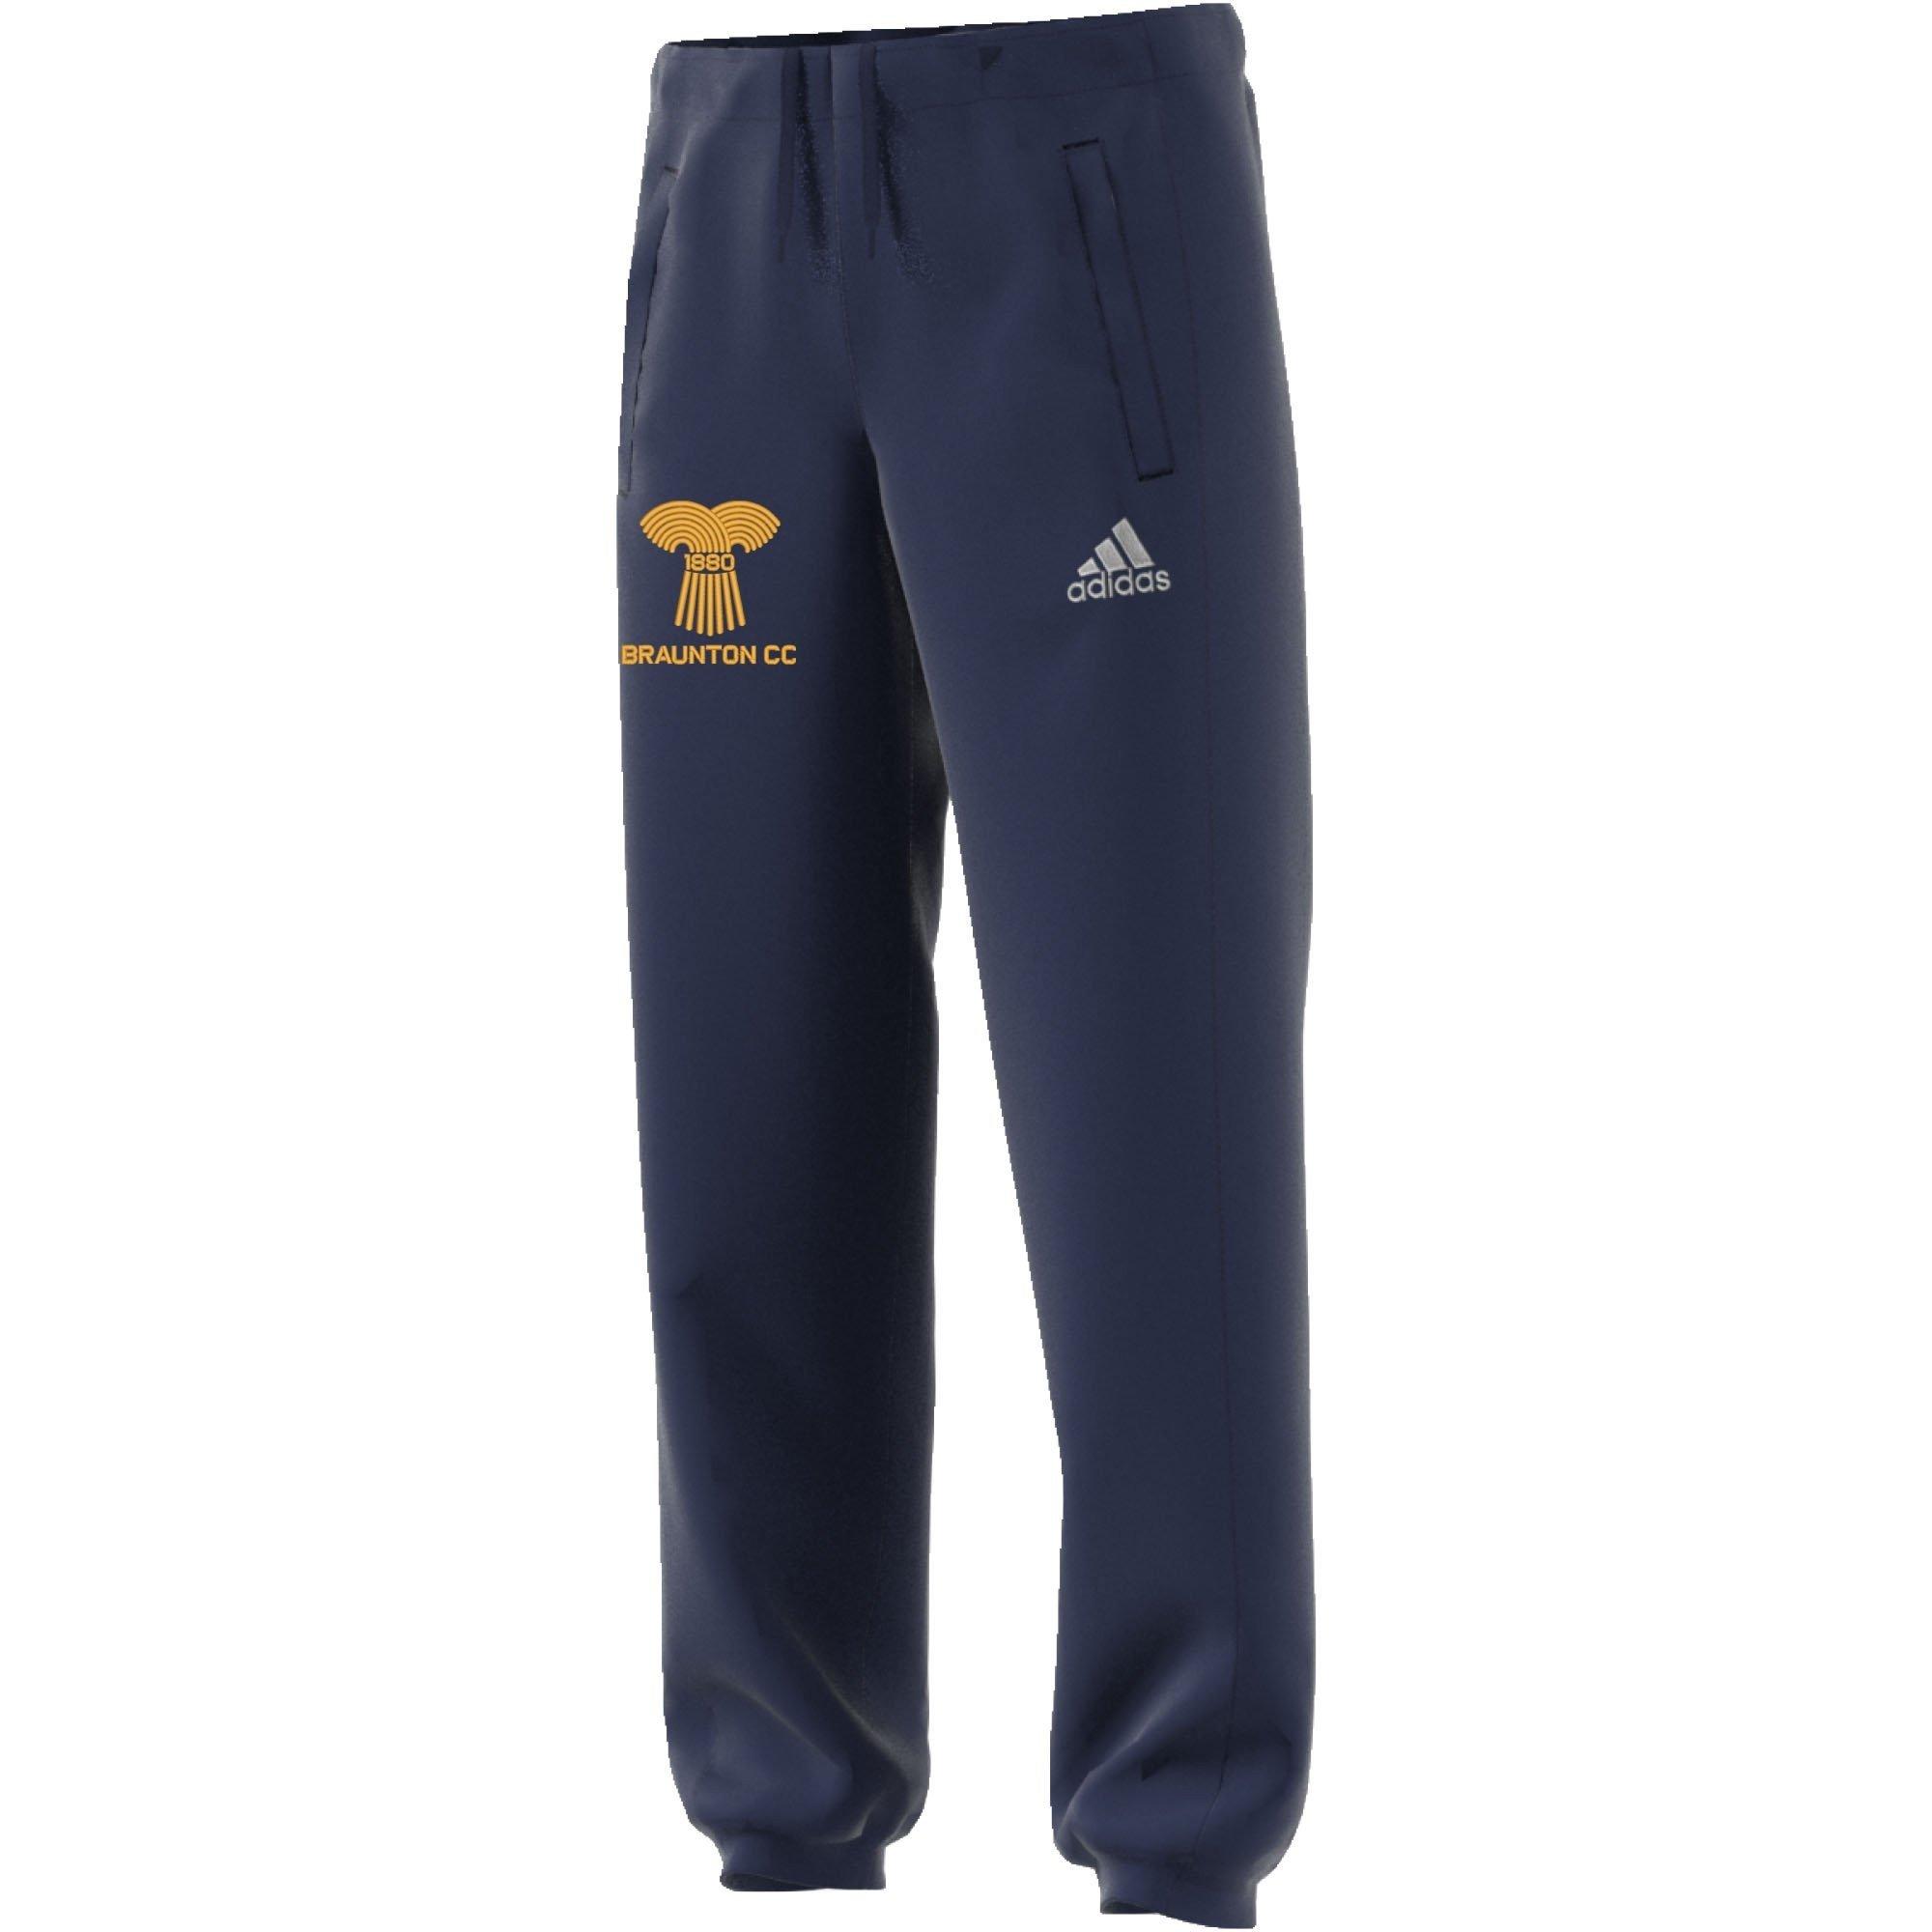 Braunton CC Adidas Navy Sweat Pants